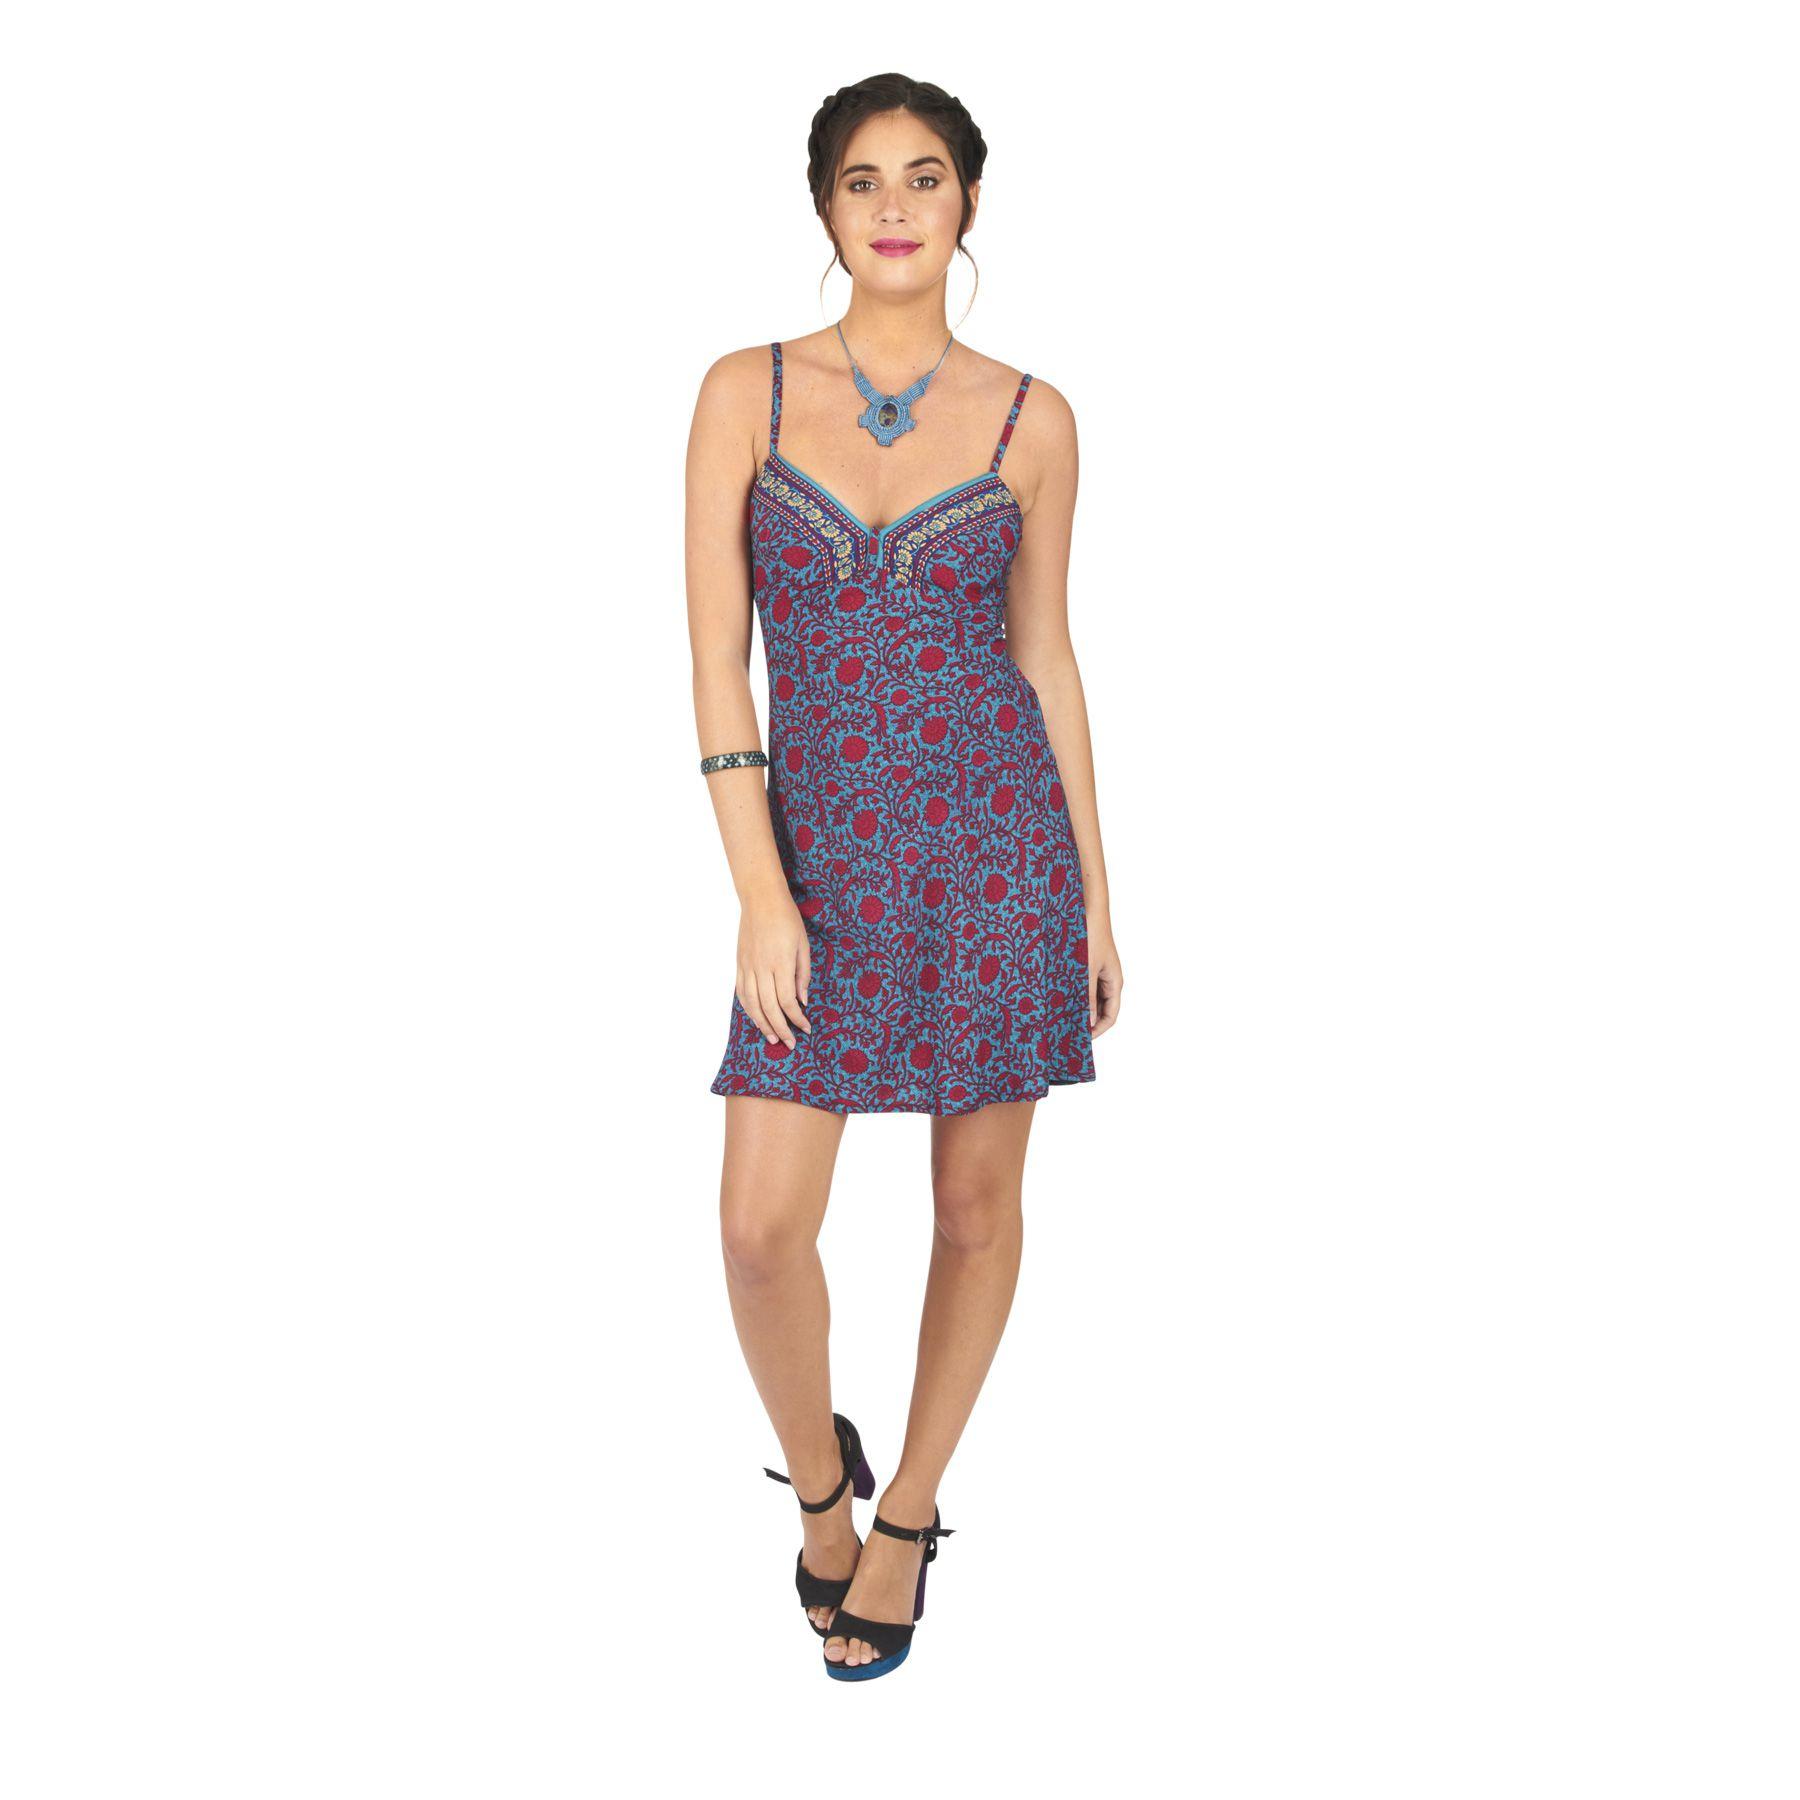 Robe caraco slip dress sexy imprimé à fleurs Sandra